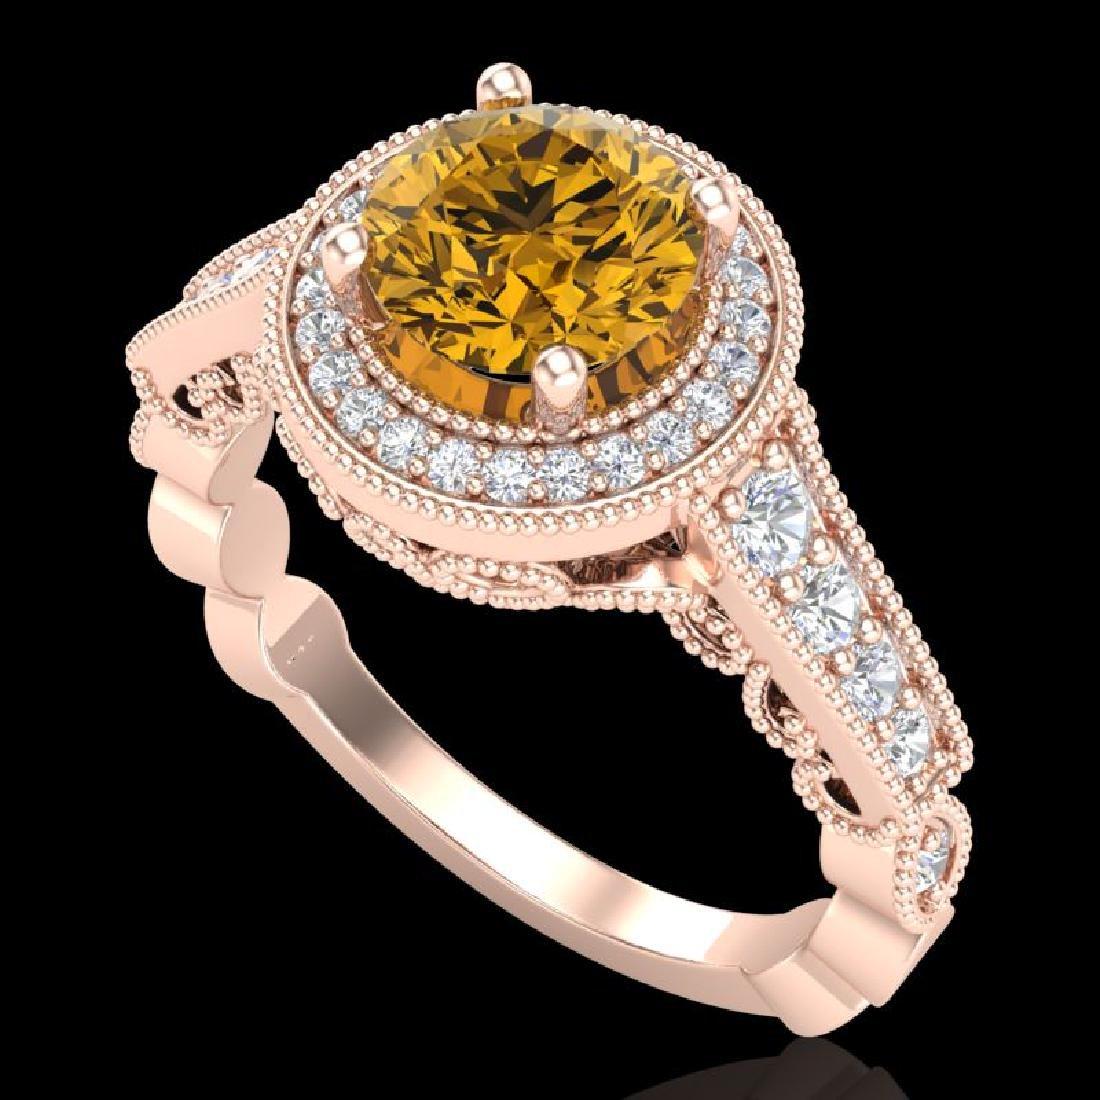 1.91 CTW Intense Fancy Yellow Diamond Engagement Art